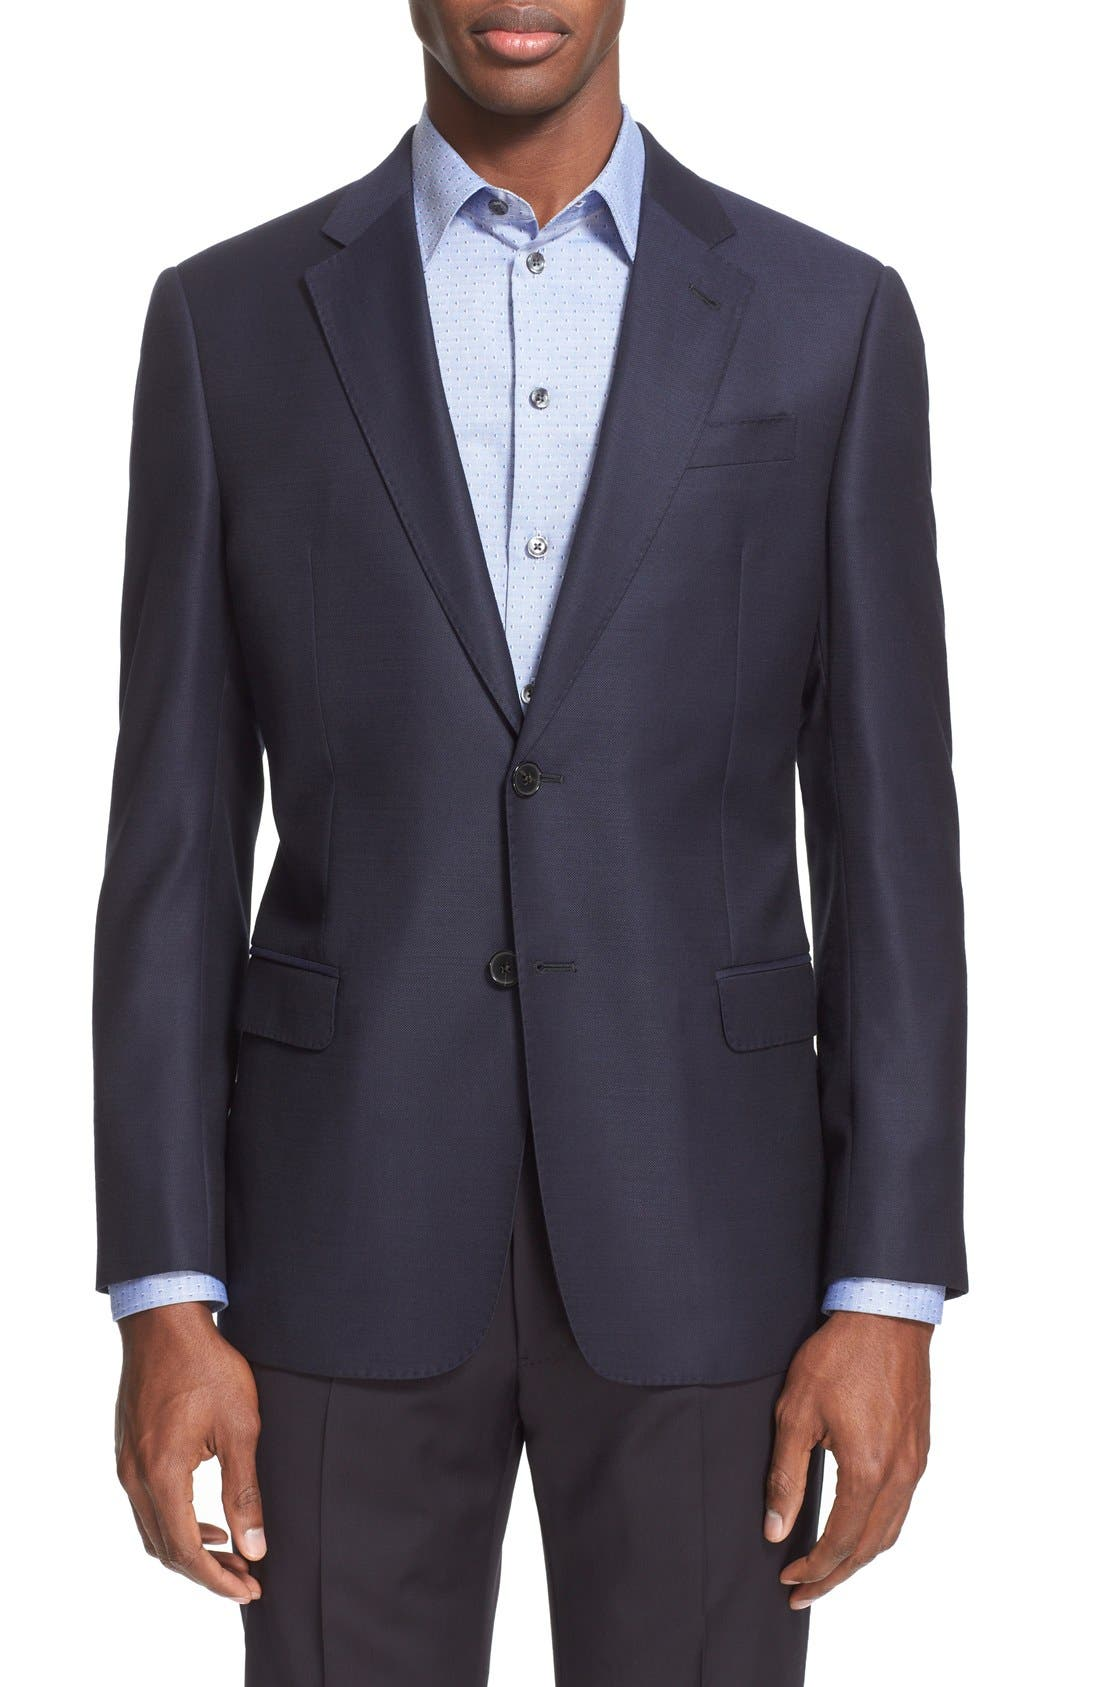 Main Image - Armani Collezioni G-Line Trim Fit Wool Blazer